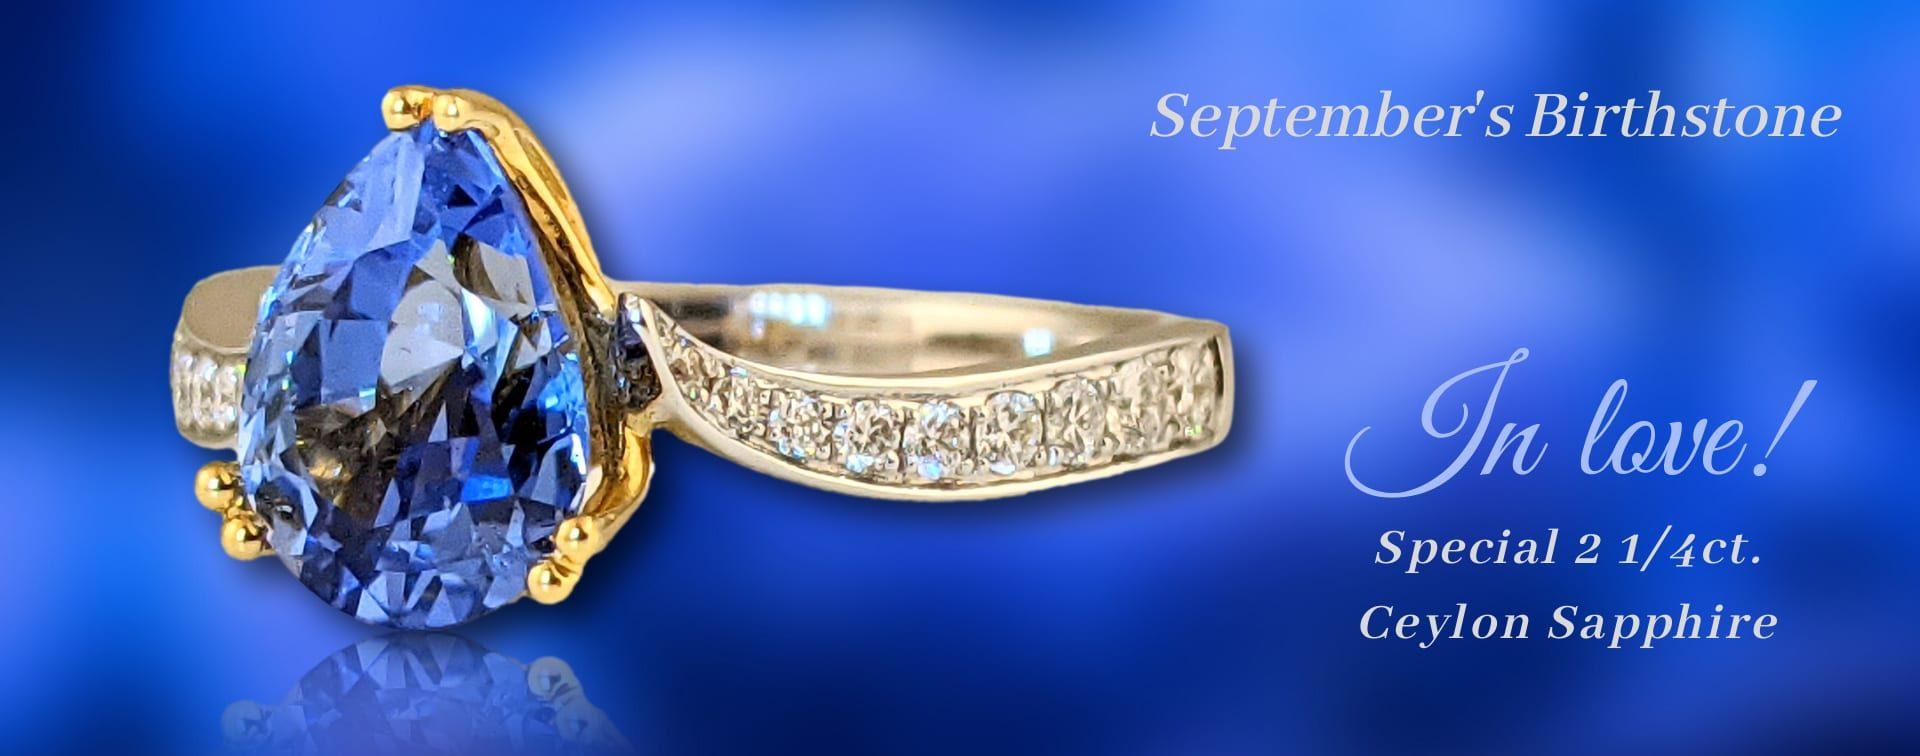 Zahm Sapphire Ring Banner